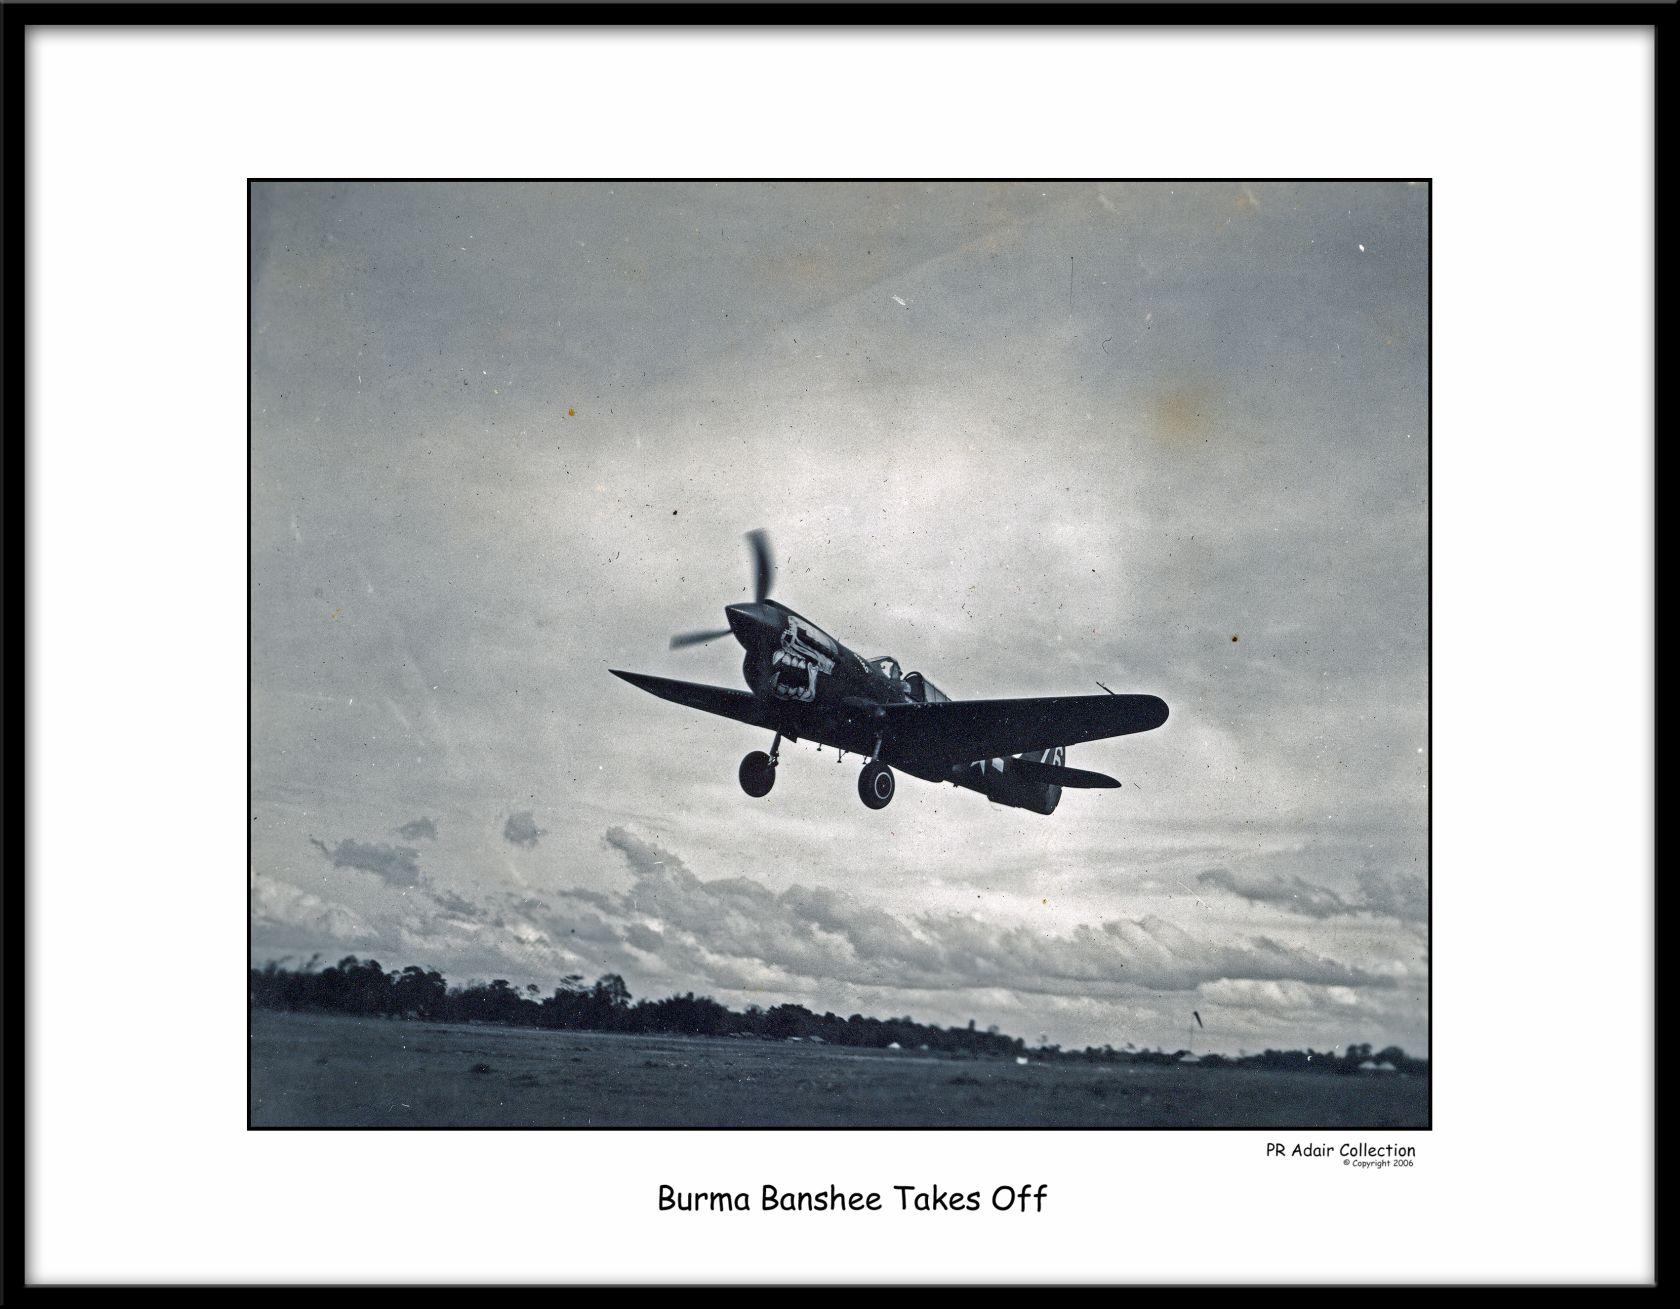 Burma Banshee 106